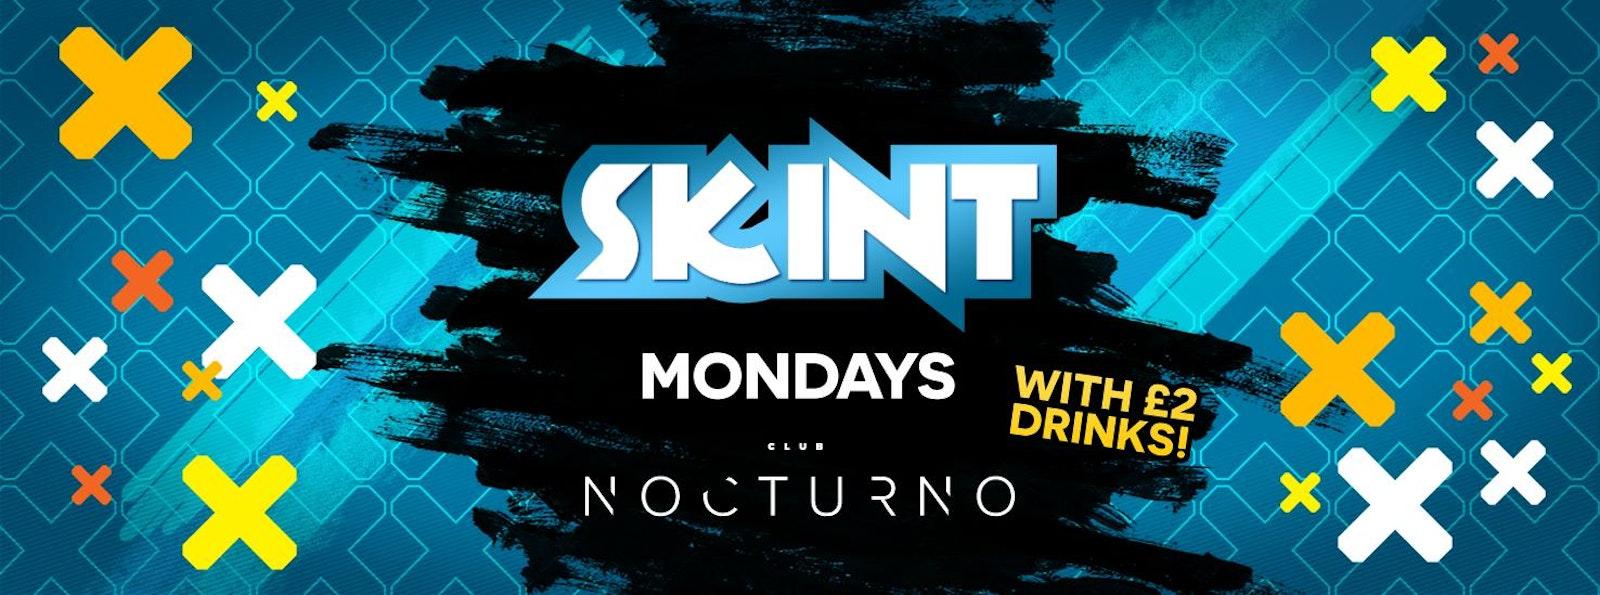 Skint Mondays at Nocturno Wakefield